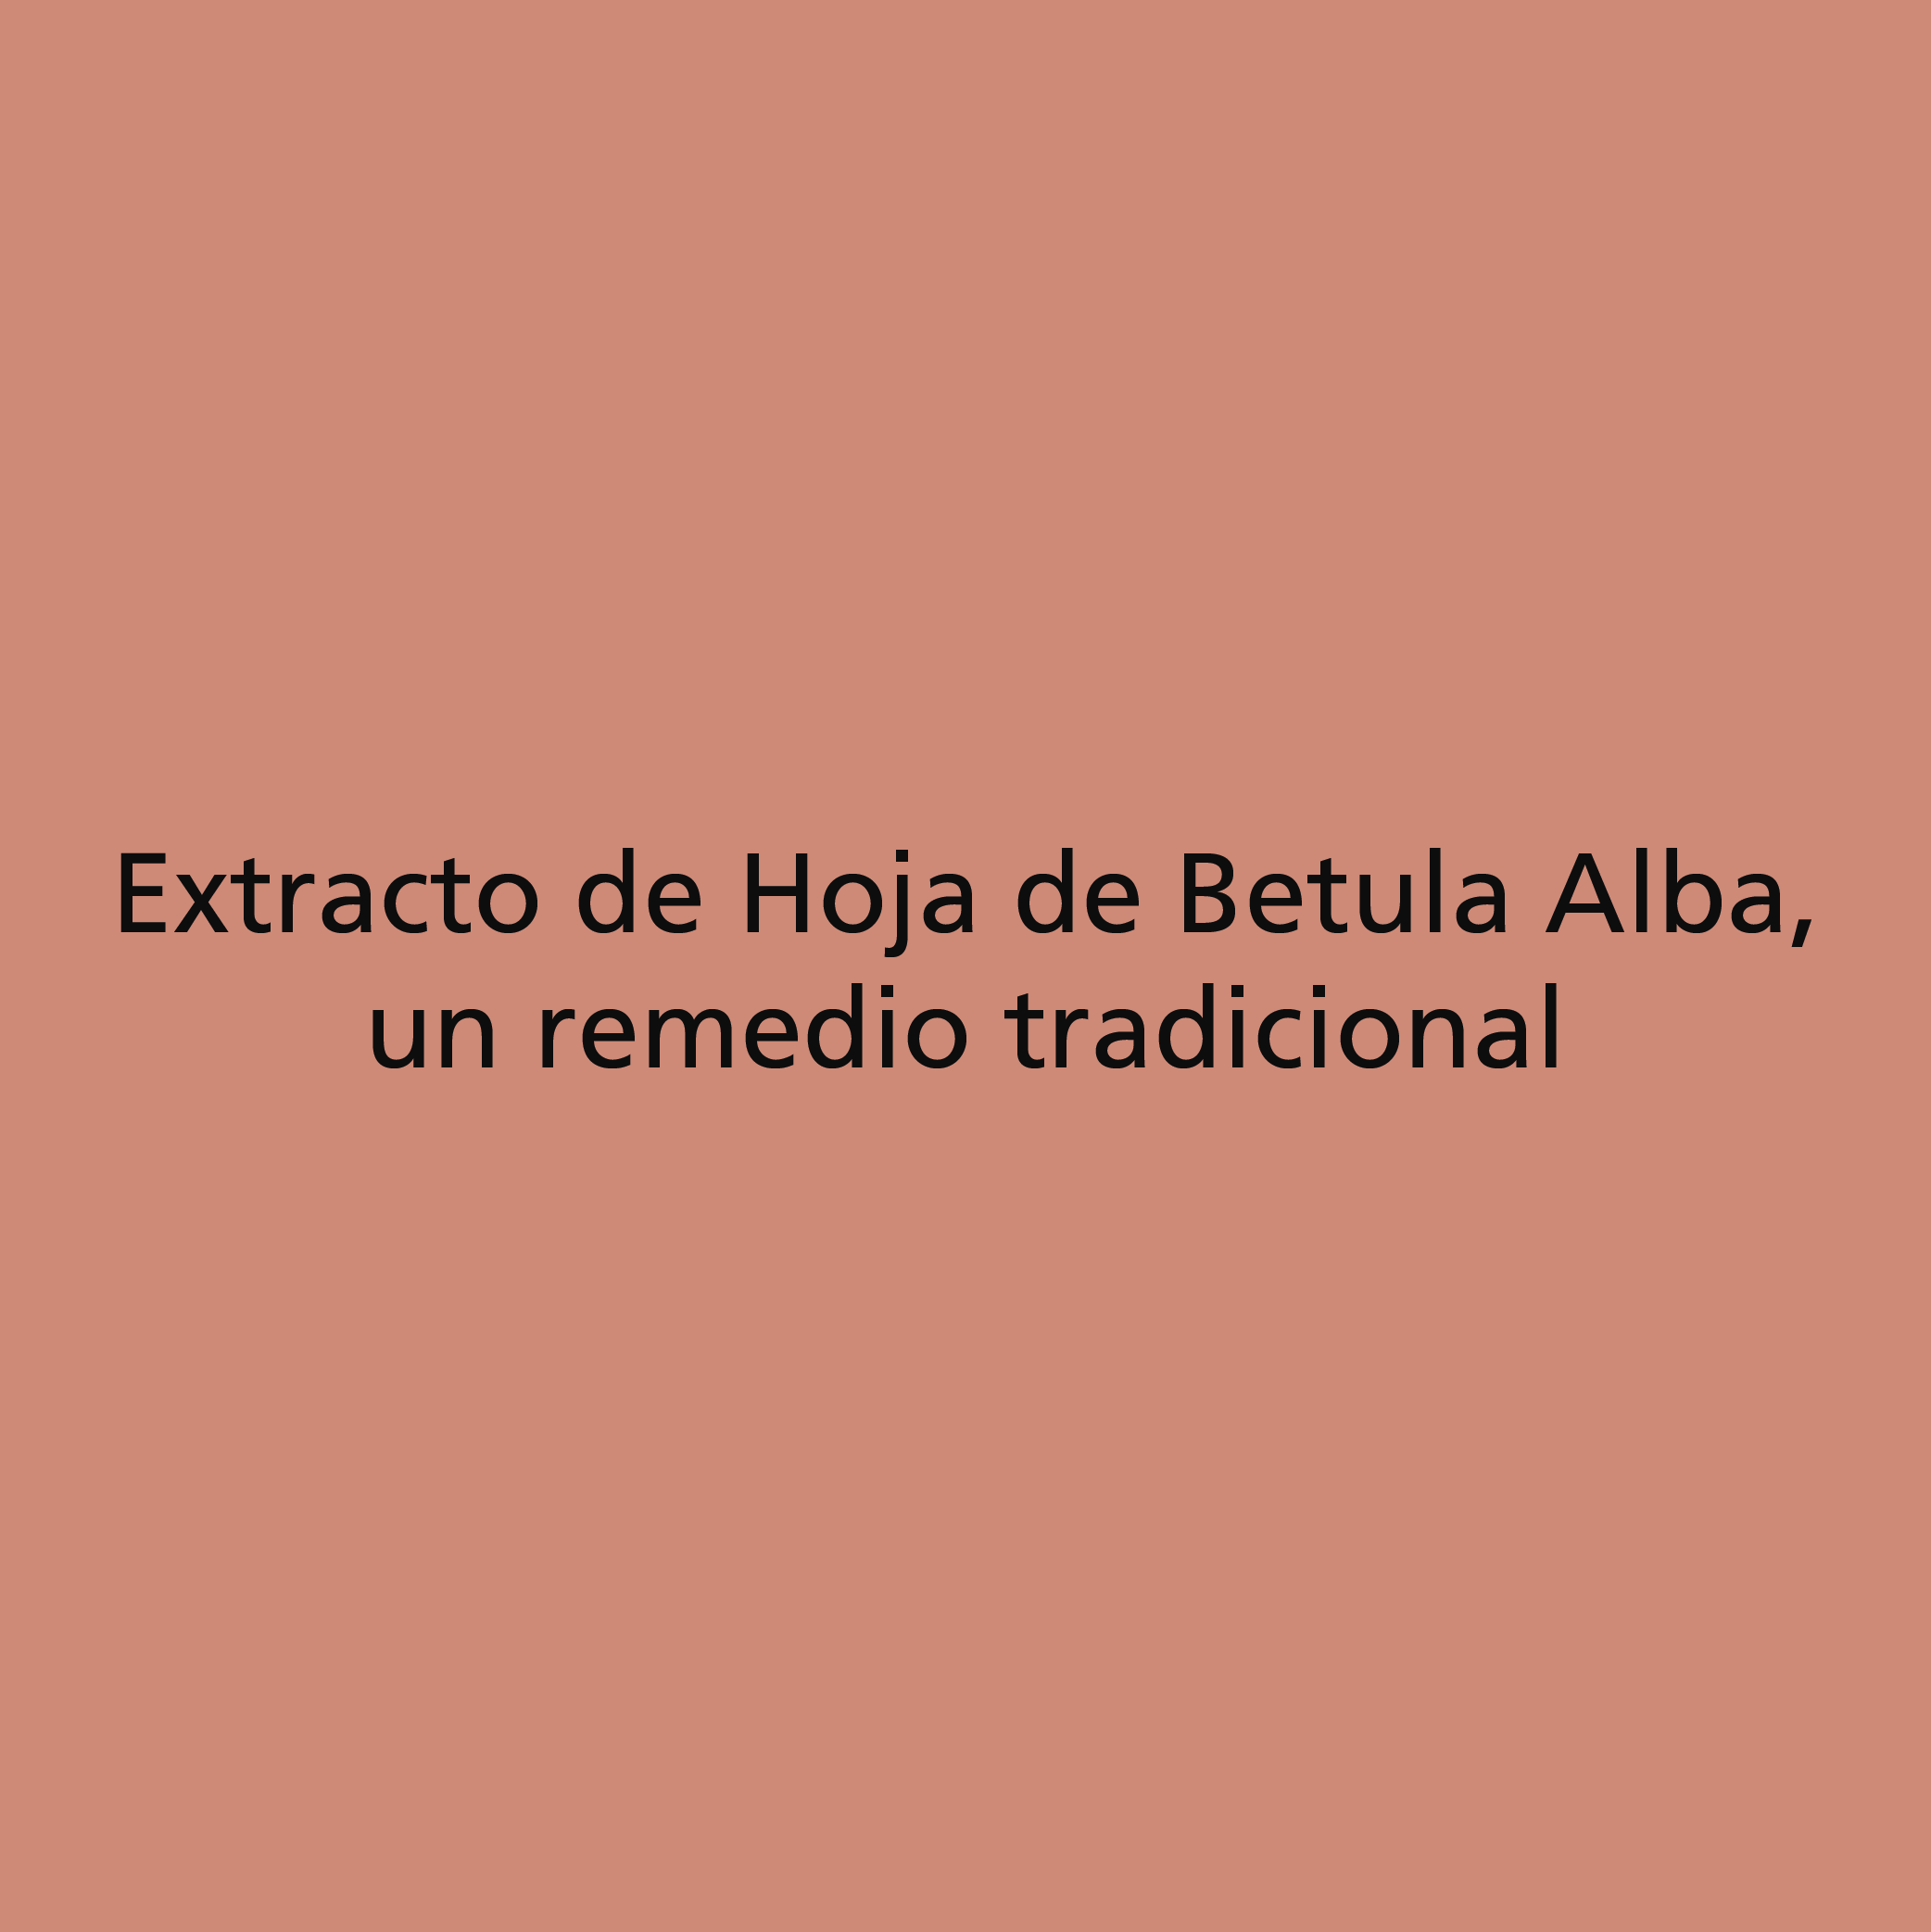 Hoja de Betula Alba